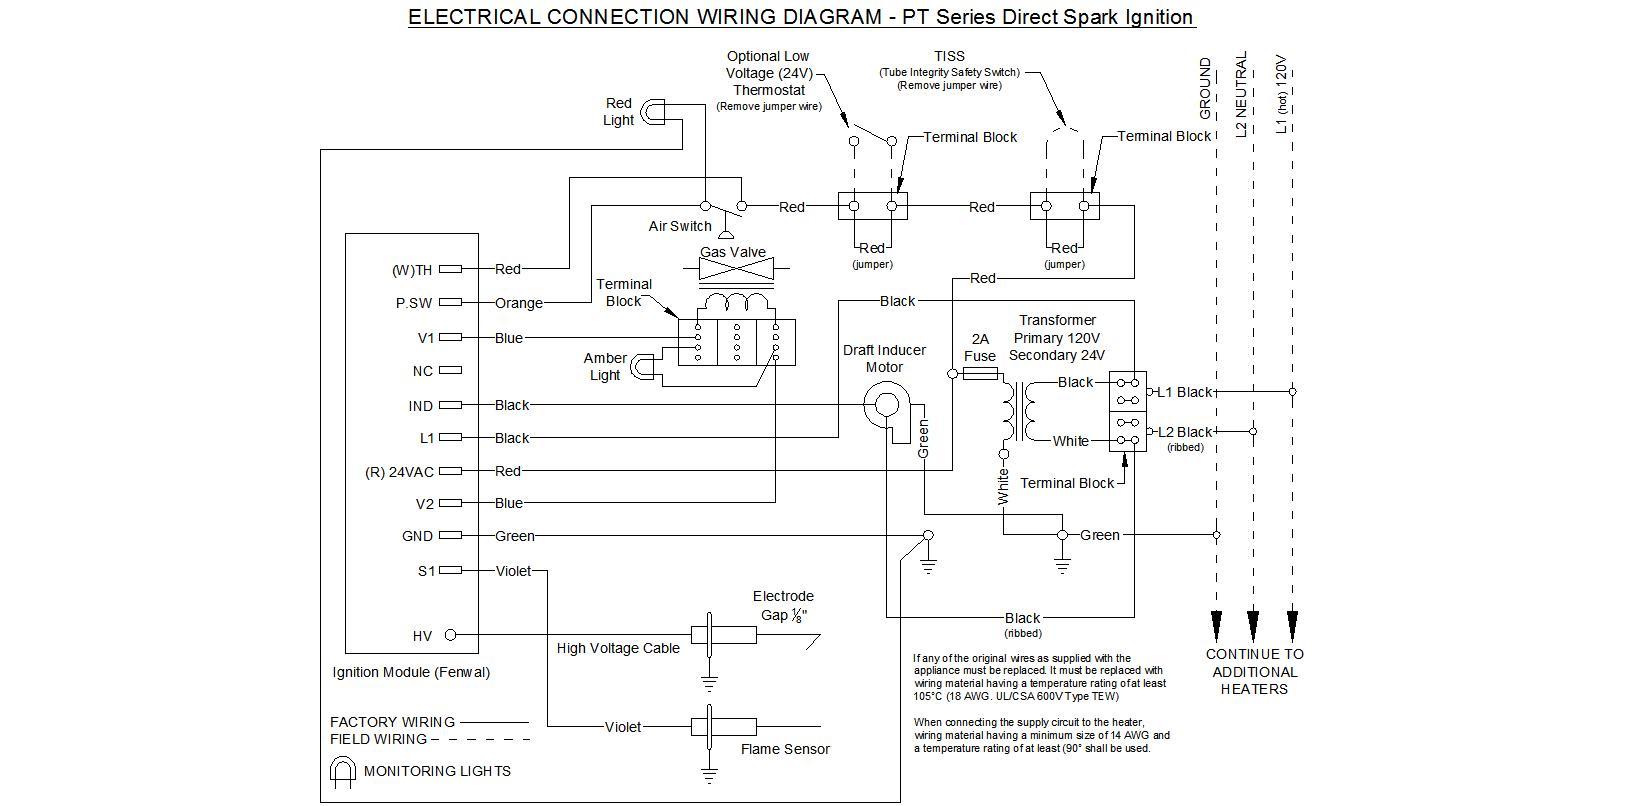 Astounding fiat punto heater wiring diagram images best image astounding fiat punto heater wiring diagram images best image ccuart Gallery